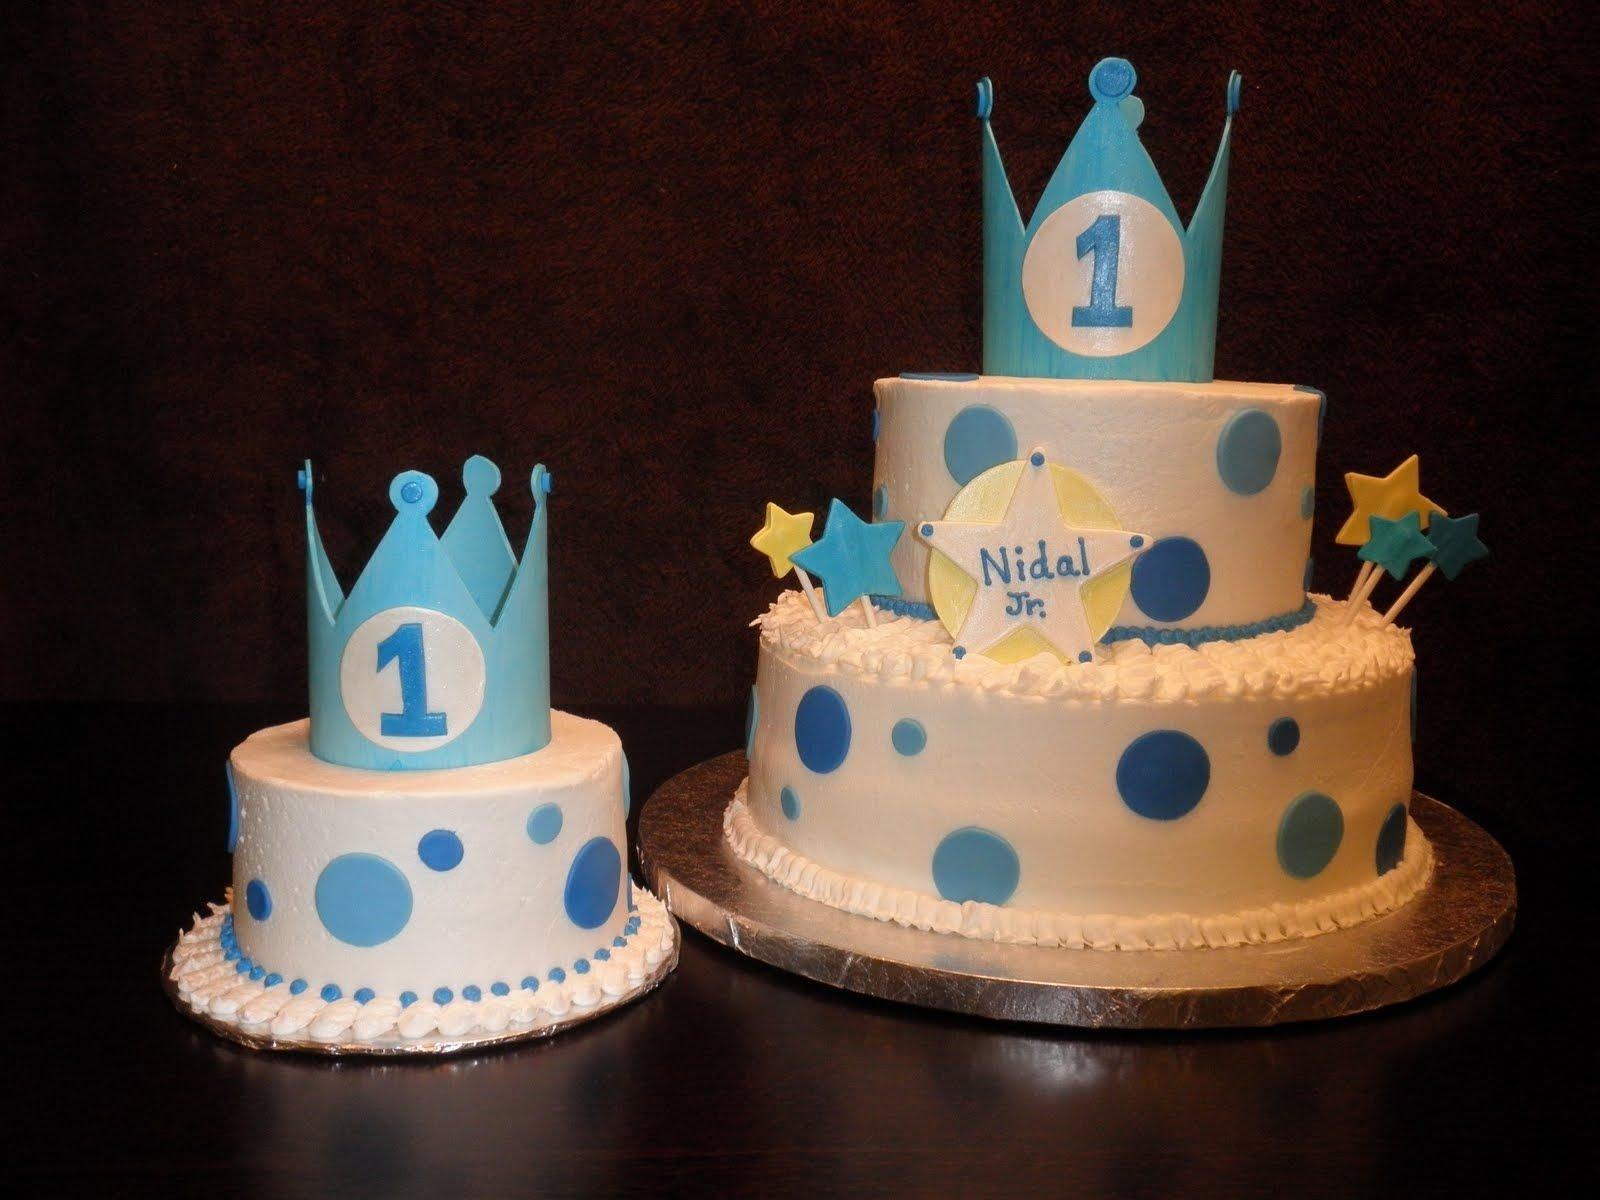 10 Cute Baby Boy First Birthday Cake Ideas boysfirstbirthdaycake this cake was for a special baby boy